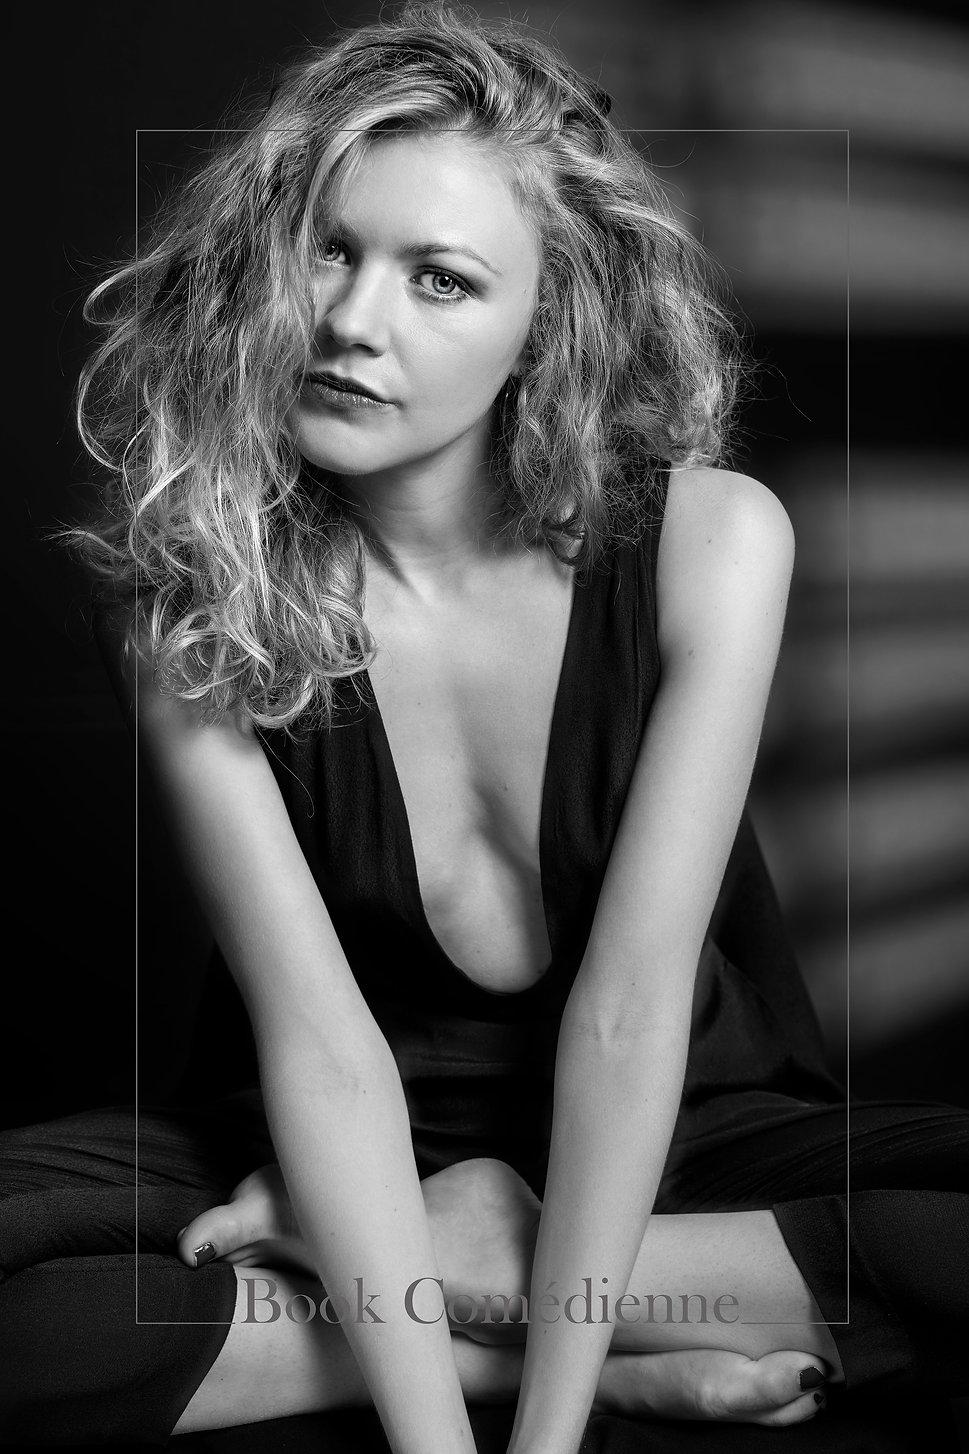 actress,studio,lignting,bnw,blond,hair,eyes